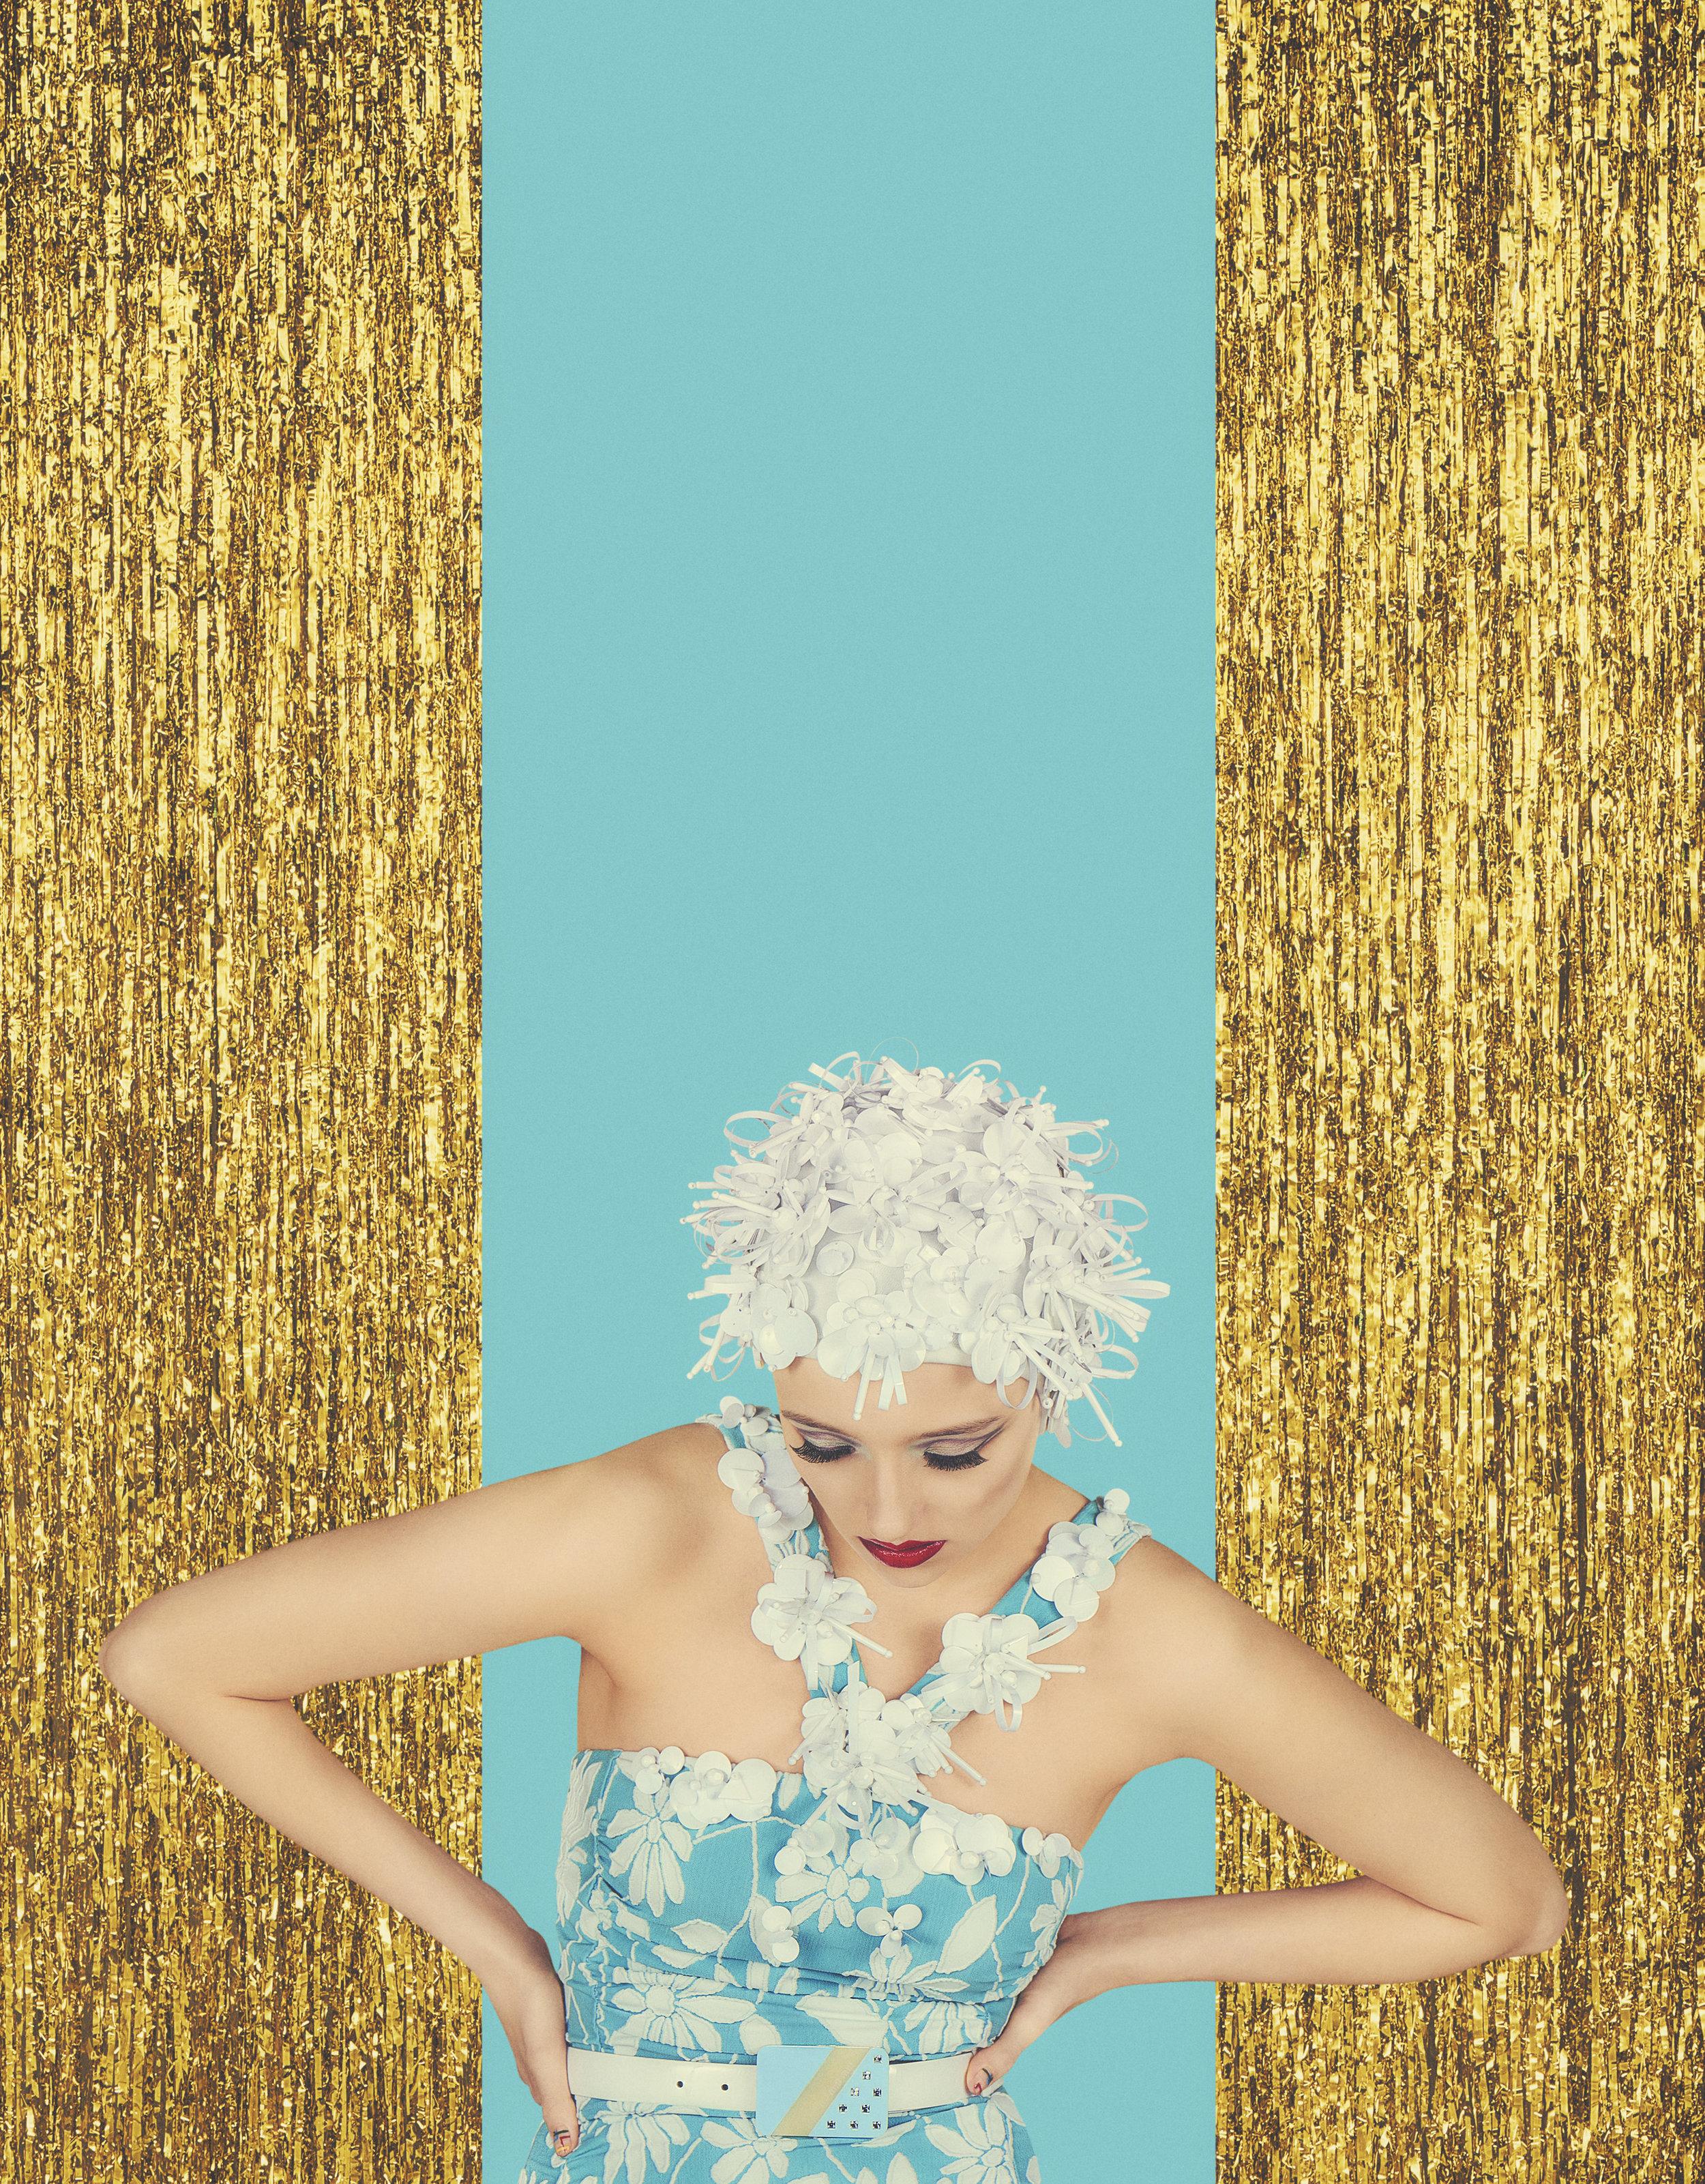 Miu Miu / George McLeod / Luxure Magazine